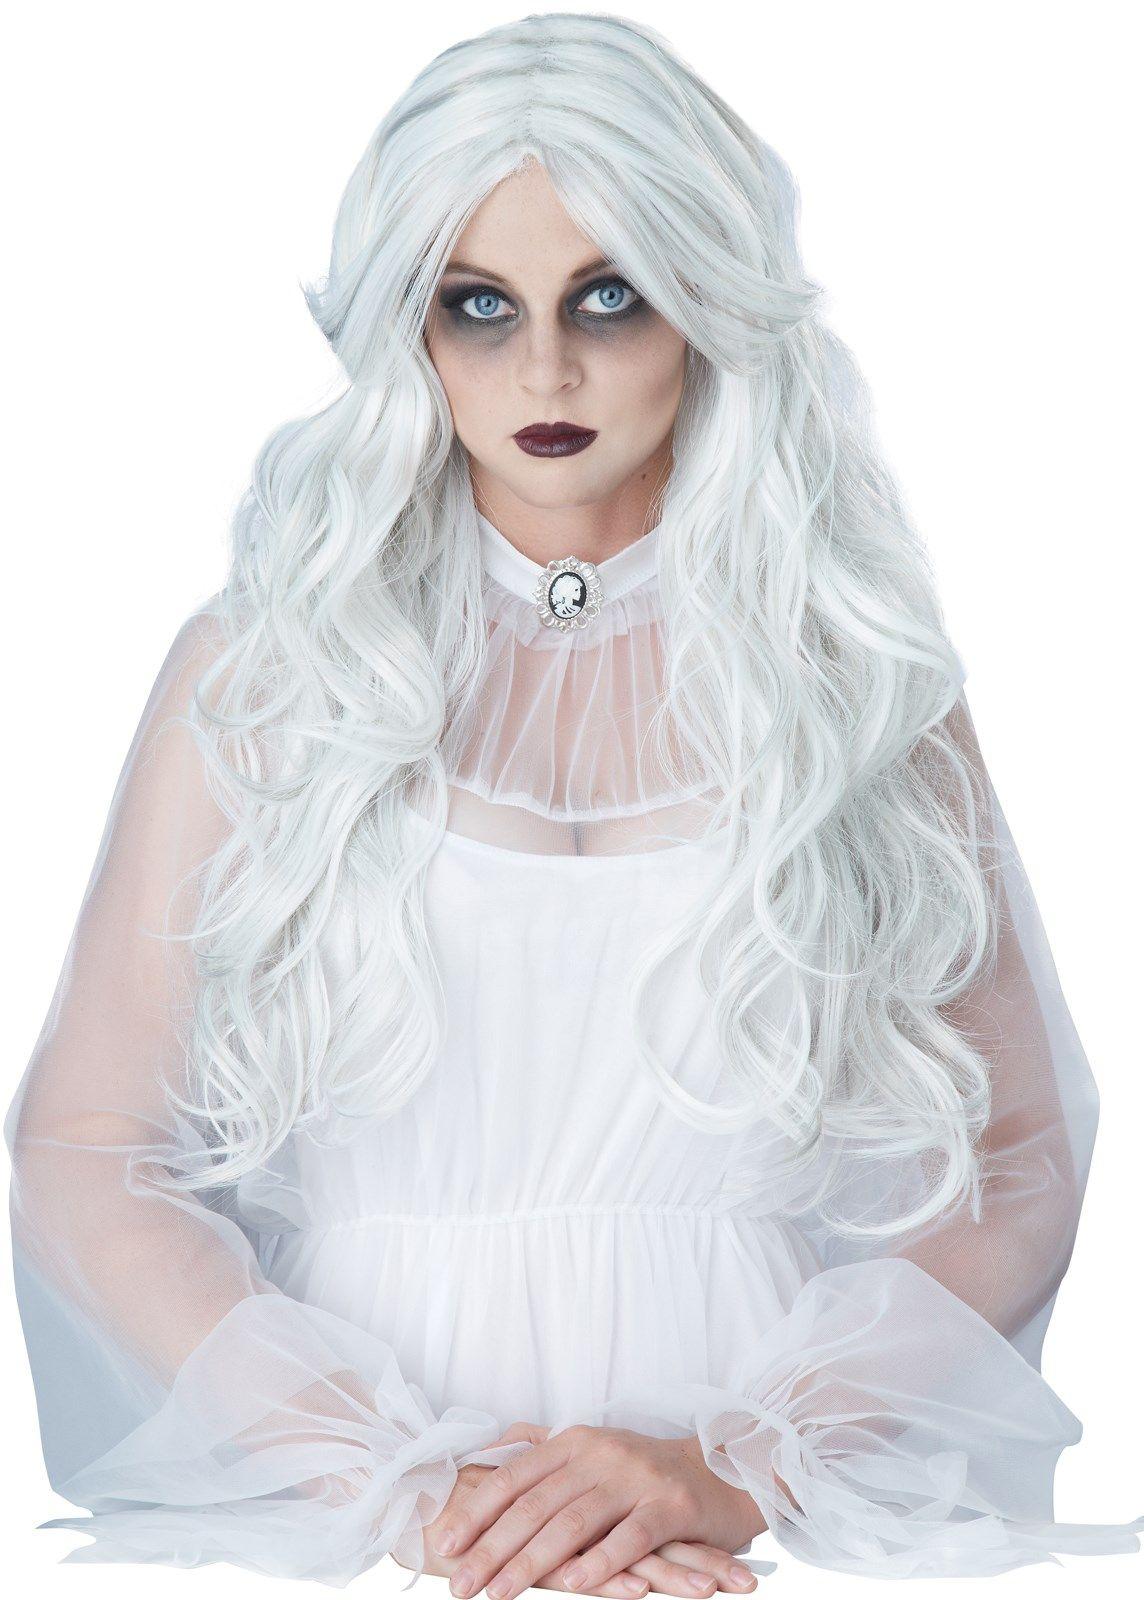 Ghost Wig For Adults,GhostAdultsWig Halloween costume